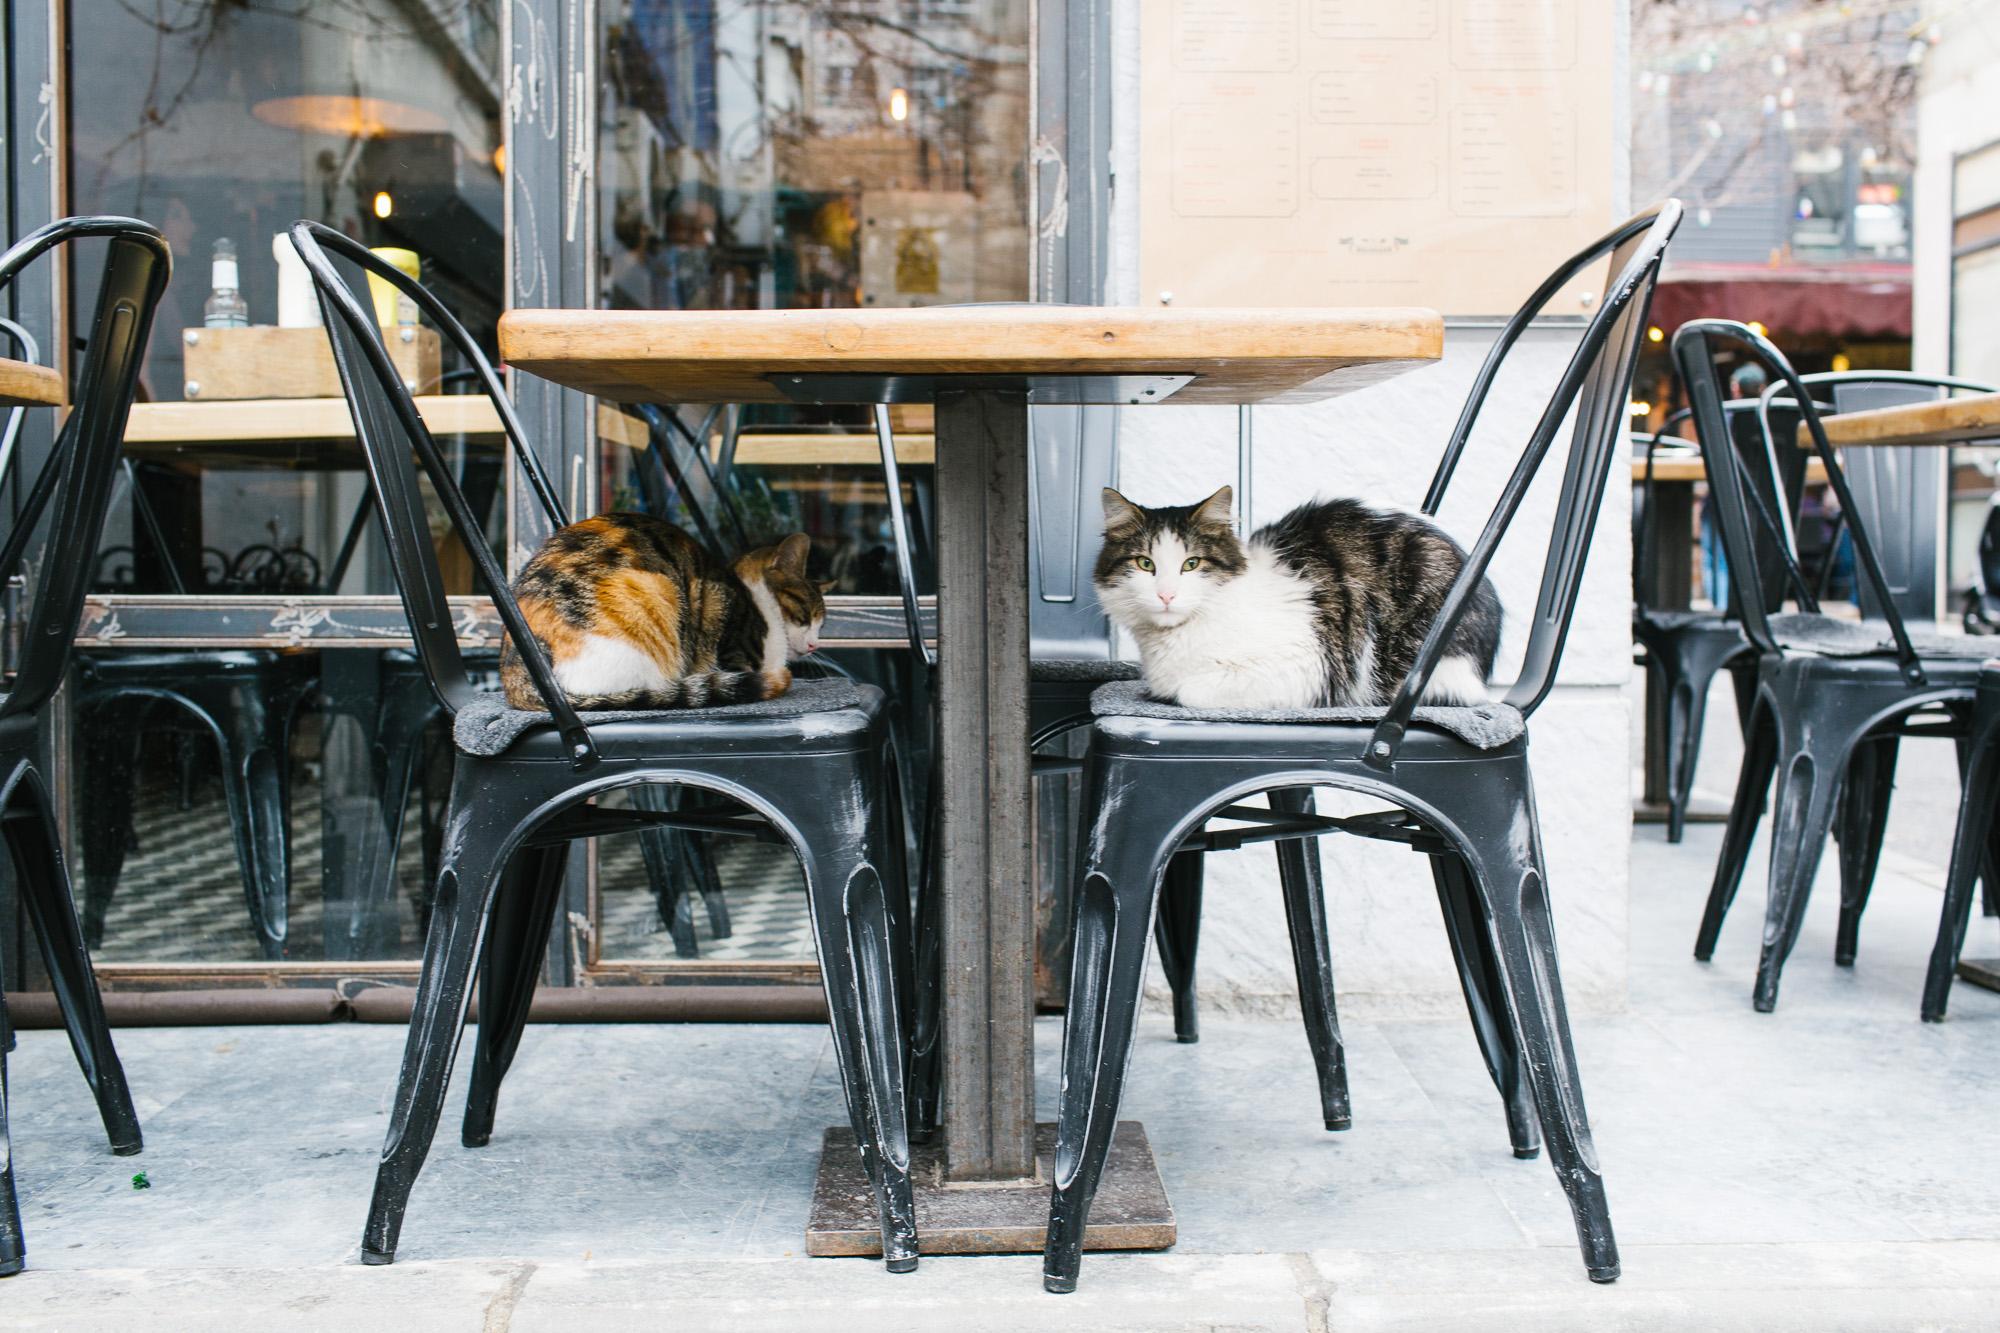 Istanbul_Coffee-AudiMagazine-FinnBeales-02.jpg